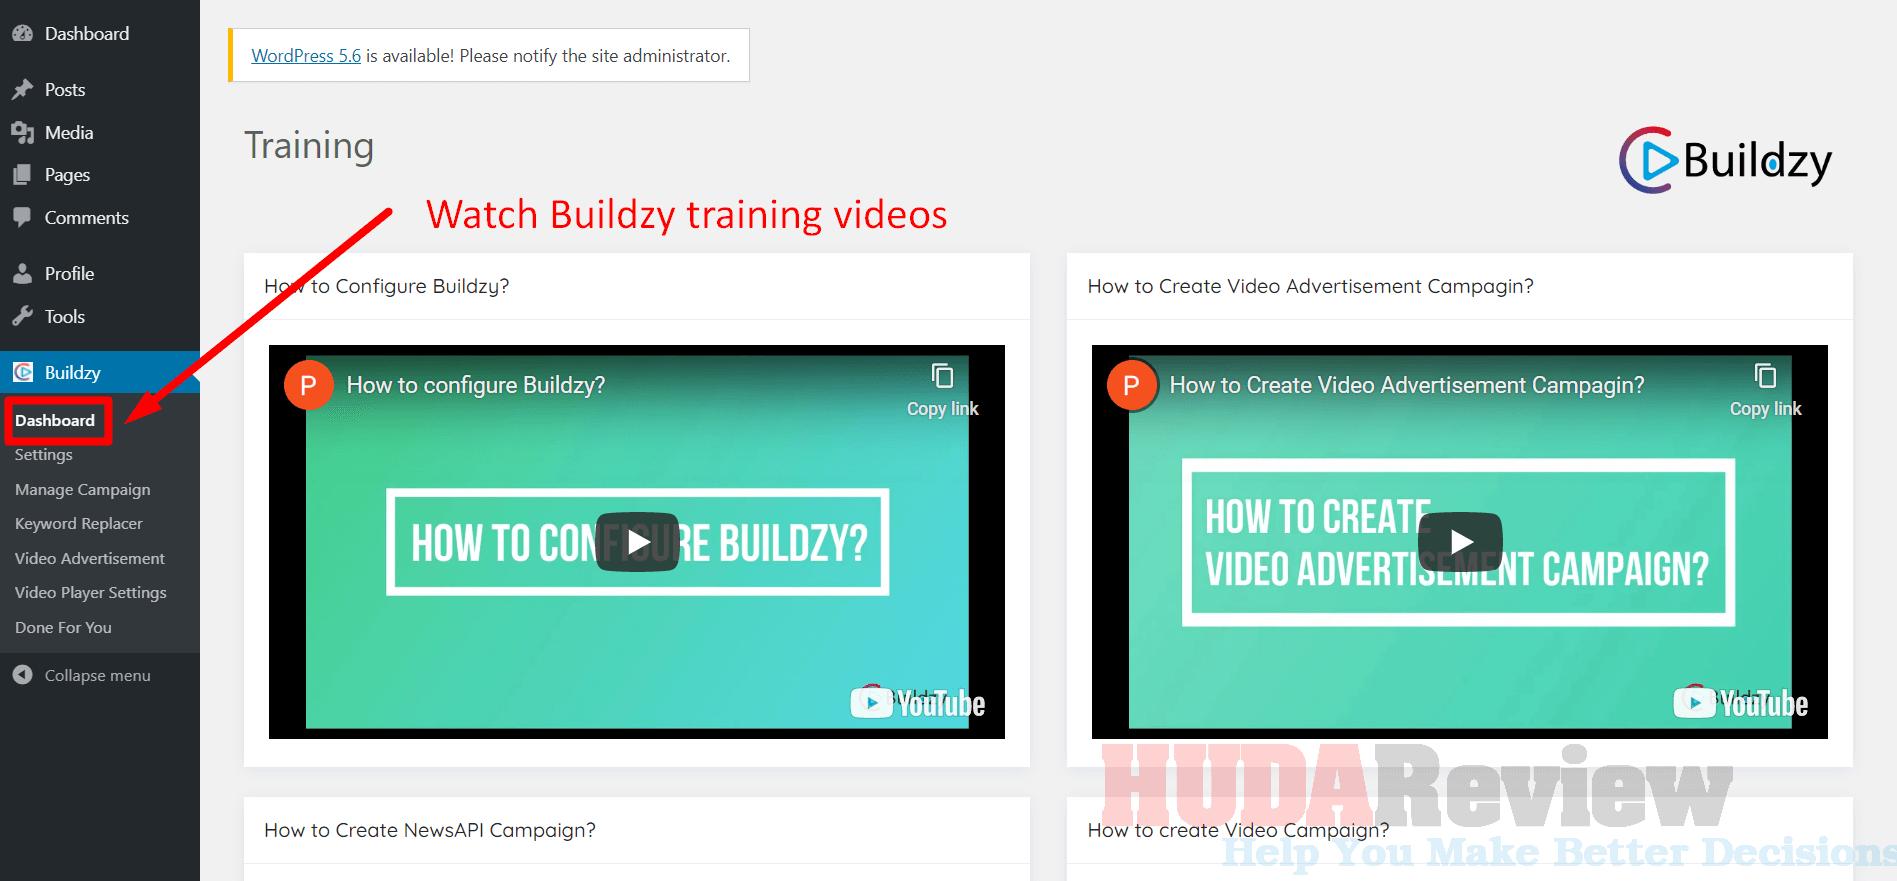 Buildzy-Review-Step-1